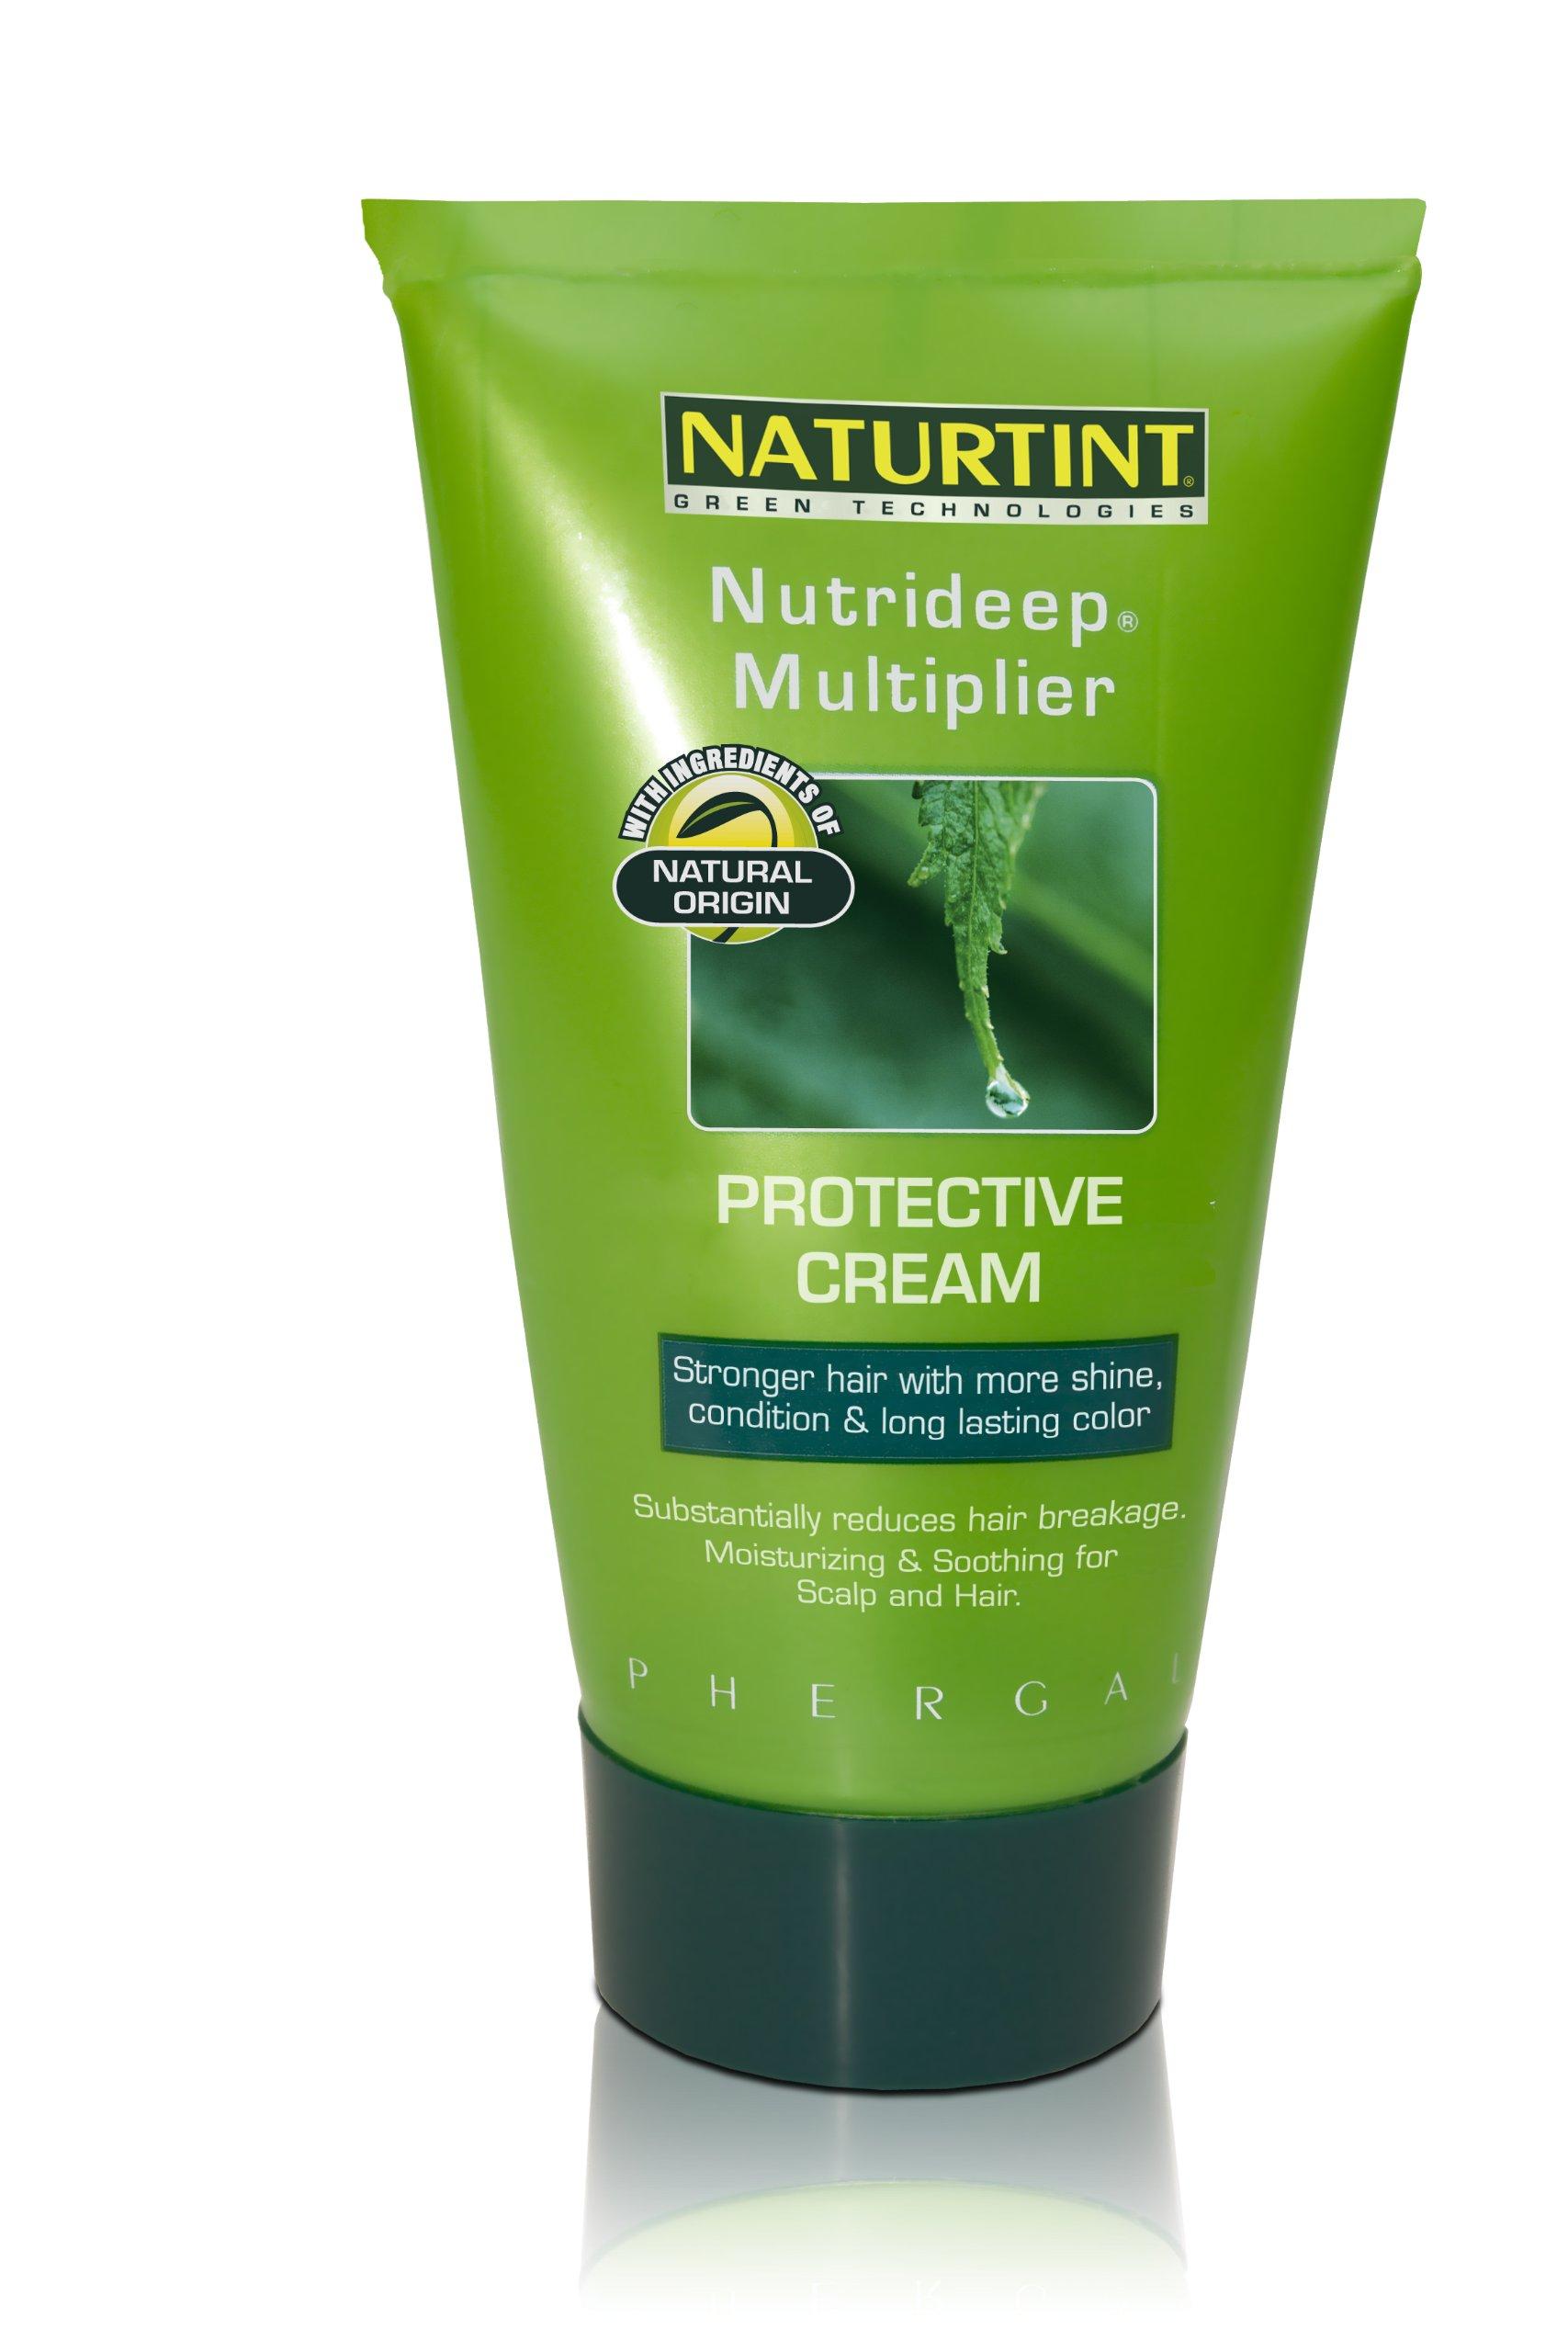 Naturtint - Nutrideep Multiplier, 5.28 oz cream